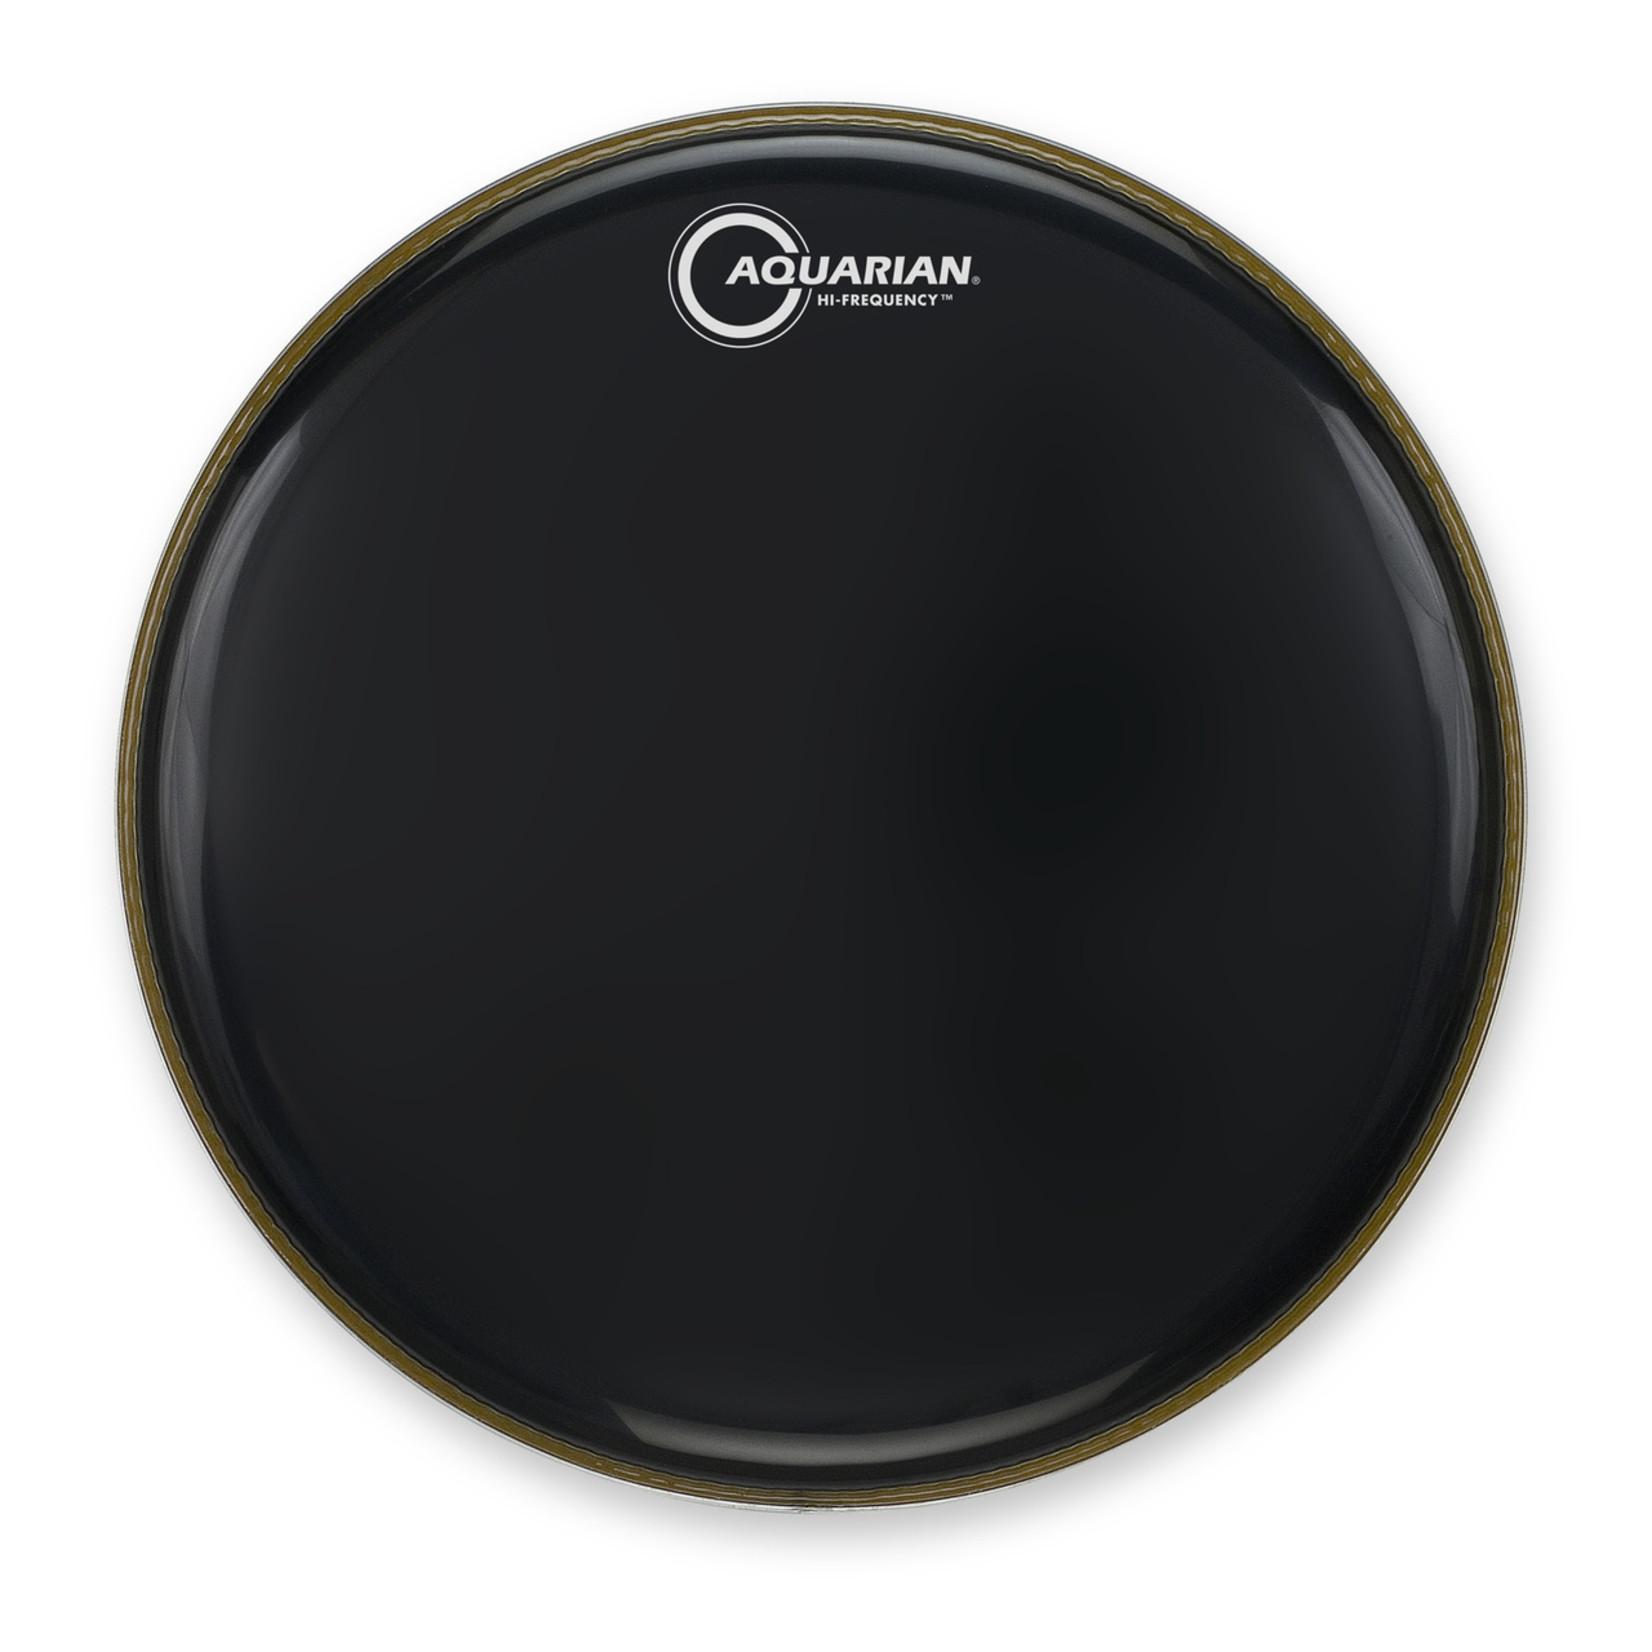 Aquarian Aquarian Hi-Frequency Black Video Gloss